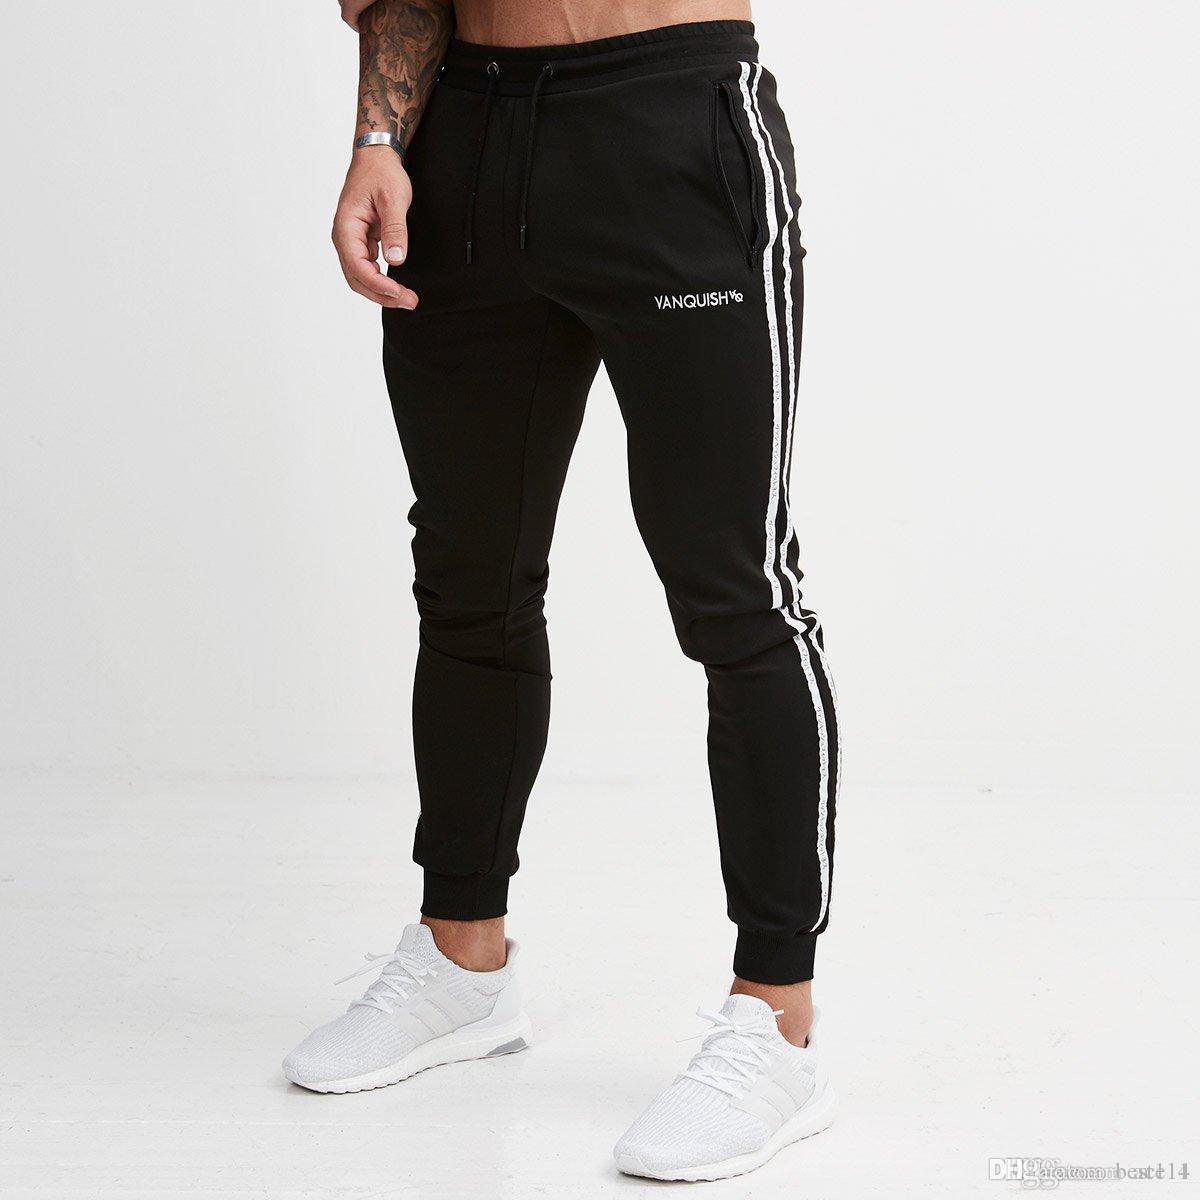 4bc5a596 2019 Jogging Pants Men Striped Sport Sweatpants Running Pants GYM Men  Cotton Long Pants Fitness Jogger Bodybuilding Trouser From Best114, $45.69  | DHgate.